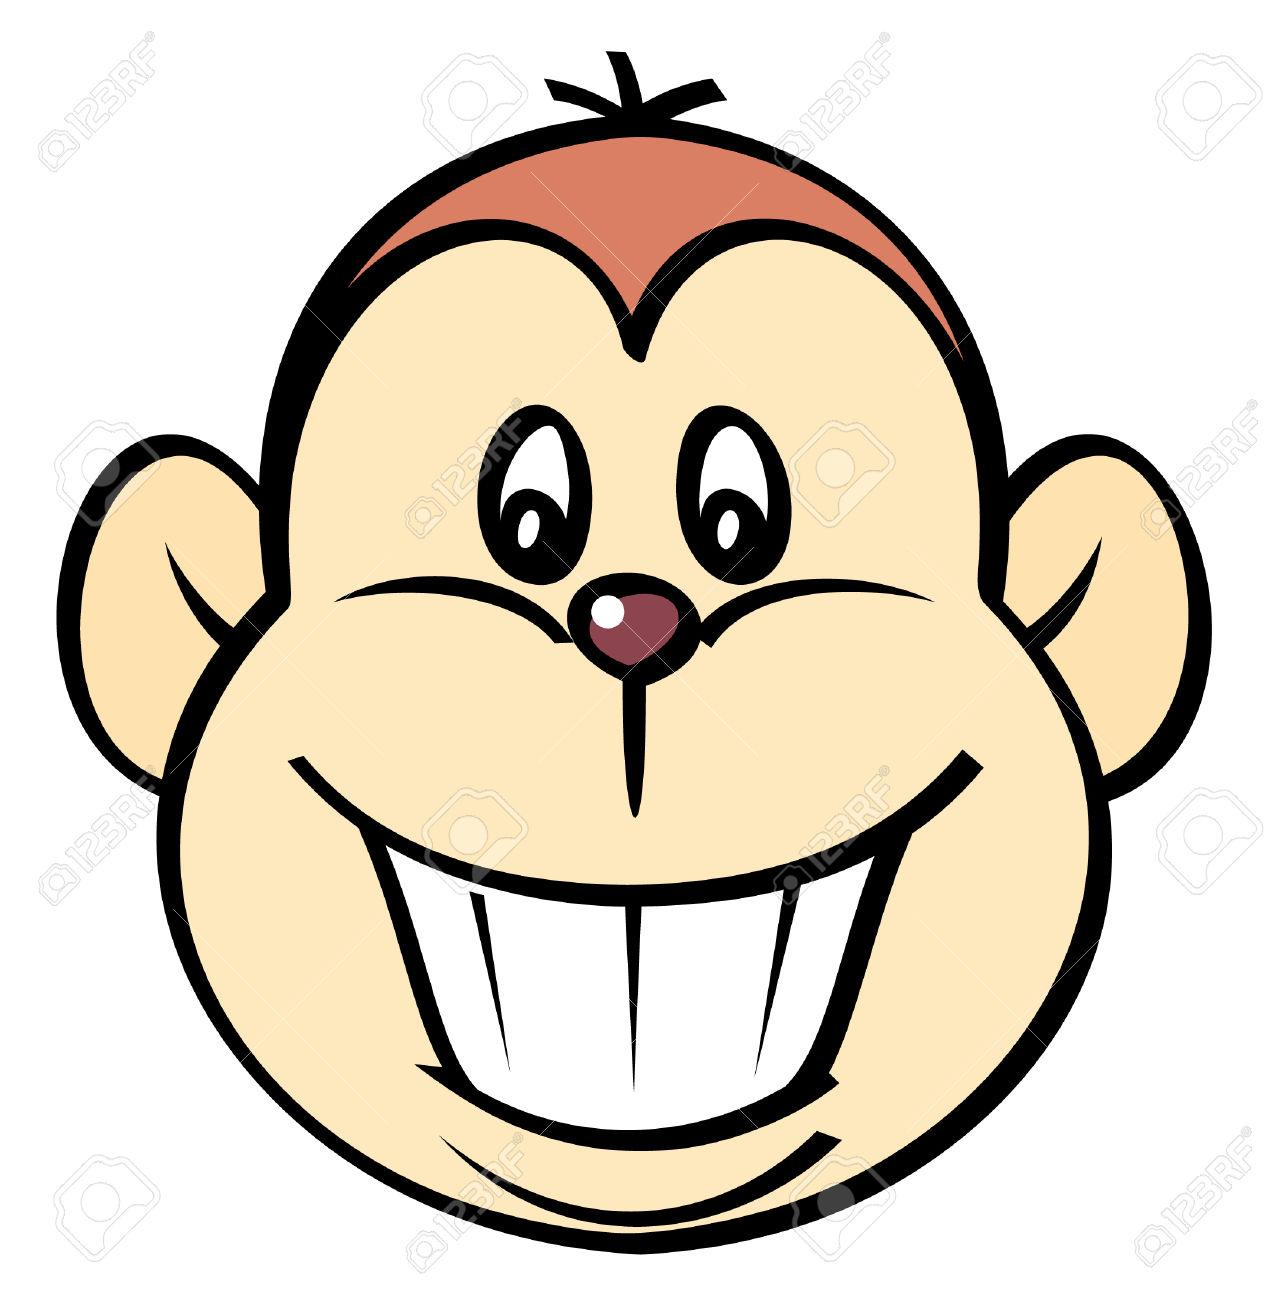 Happy Monkey Vector Illustration Royalty Free Cliparts Vectors